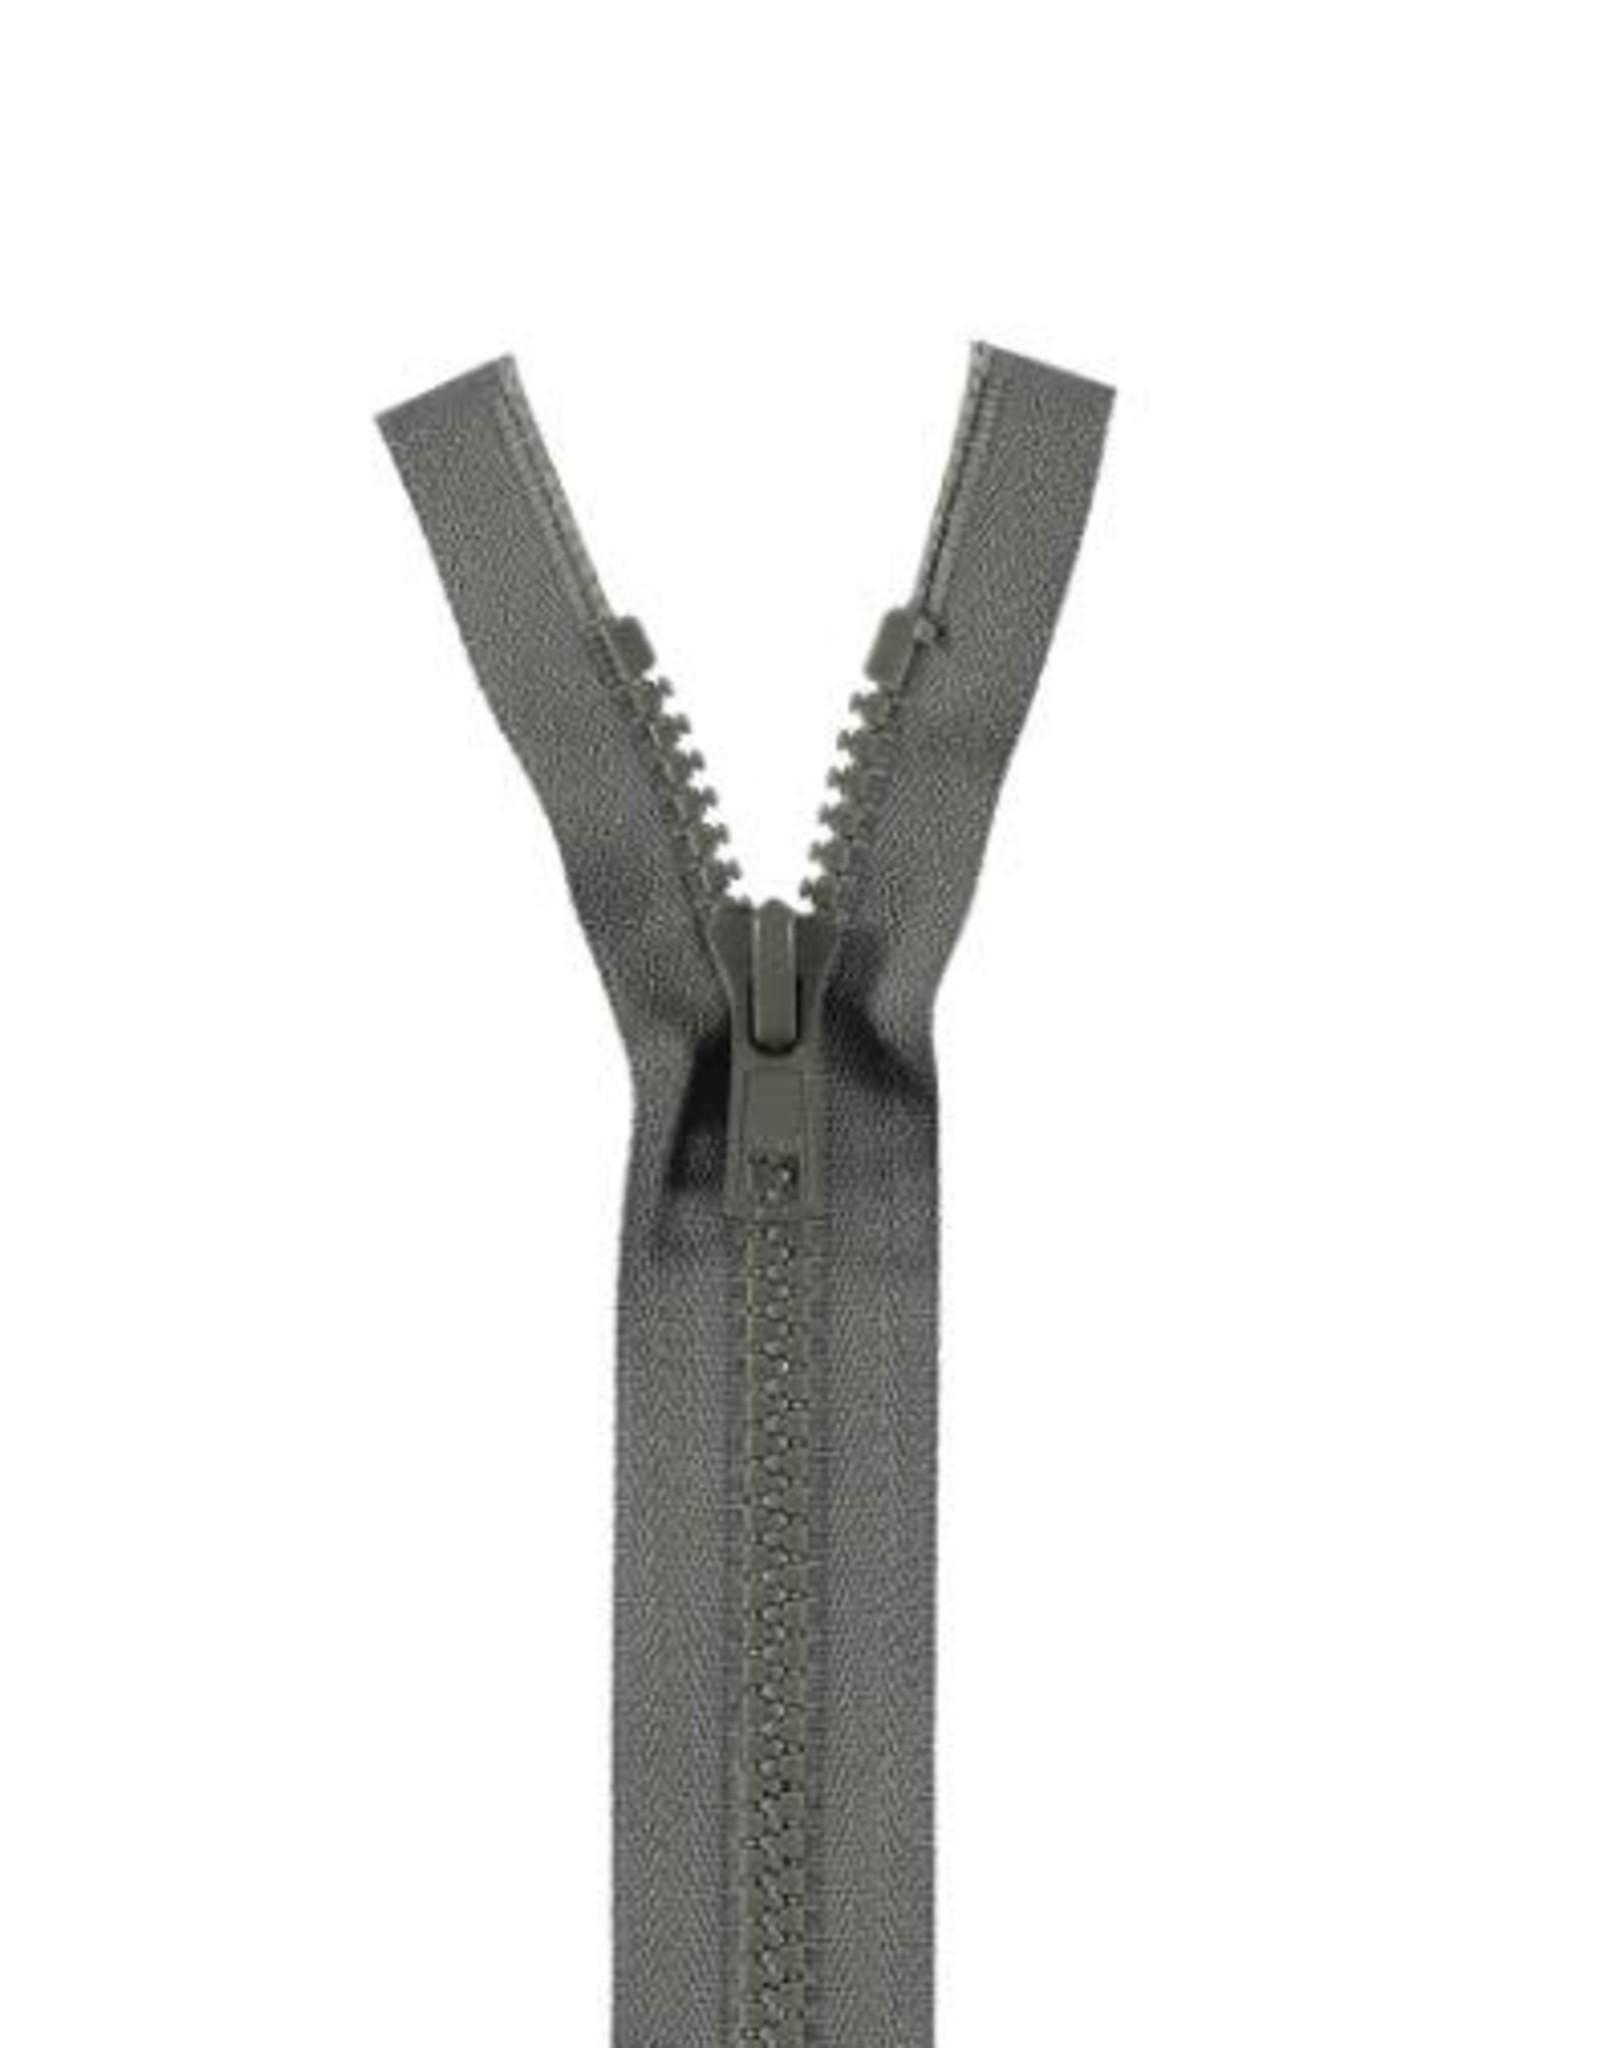 YKK BLOKRITS 5 DEELBAAR grijs 578-65cm